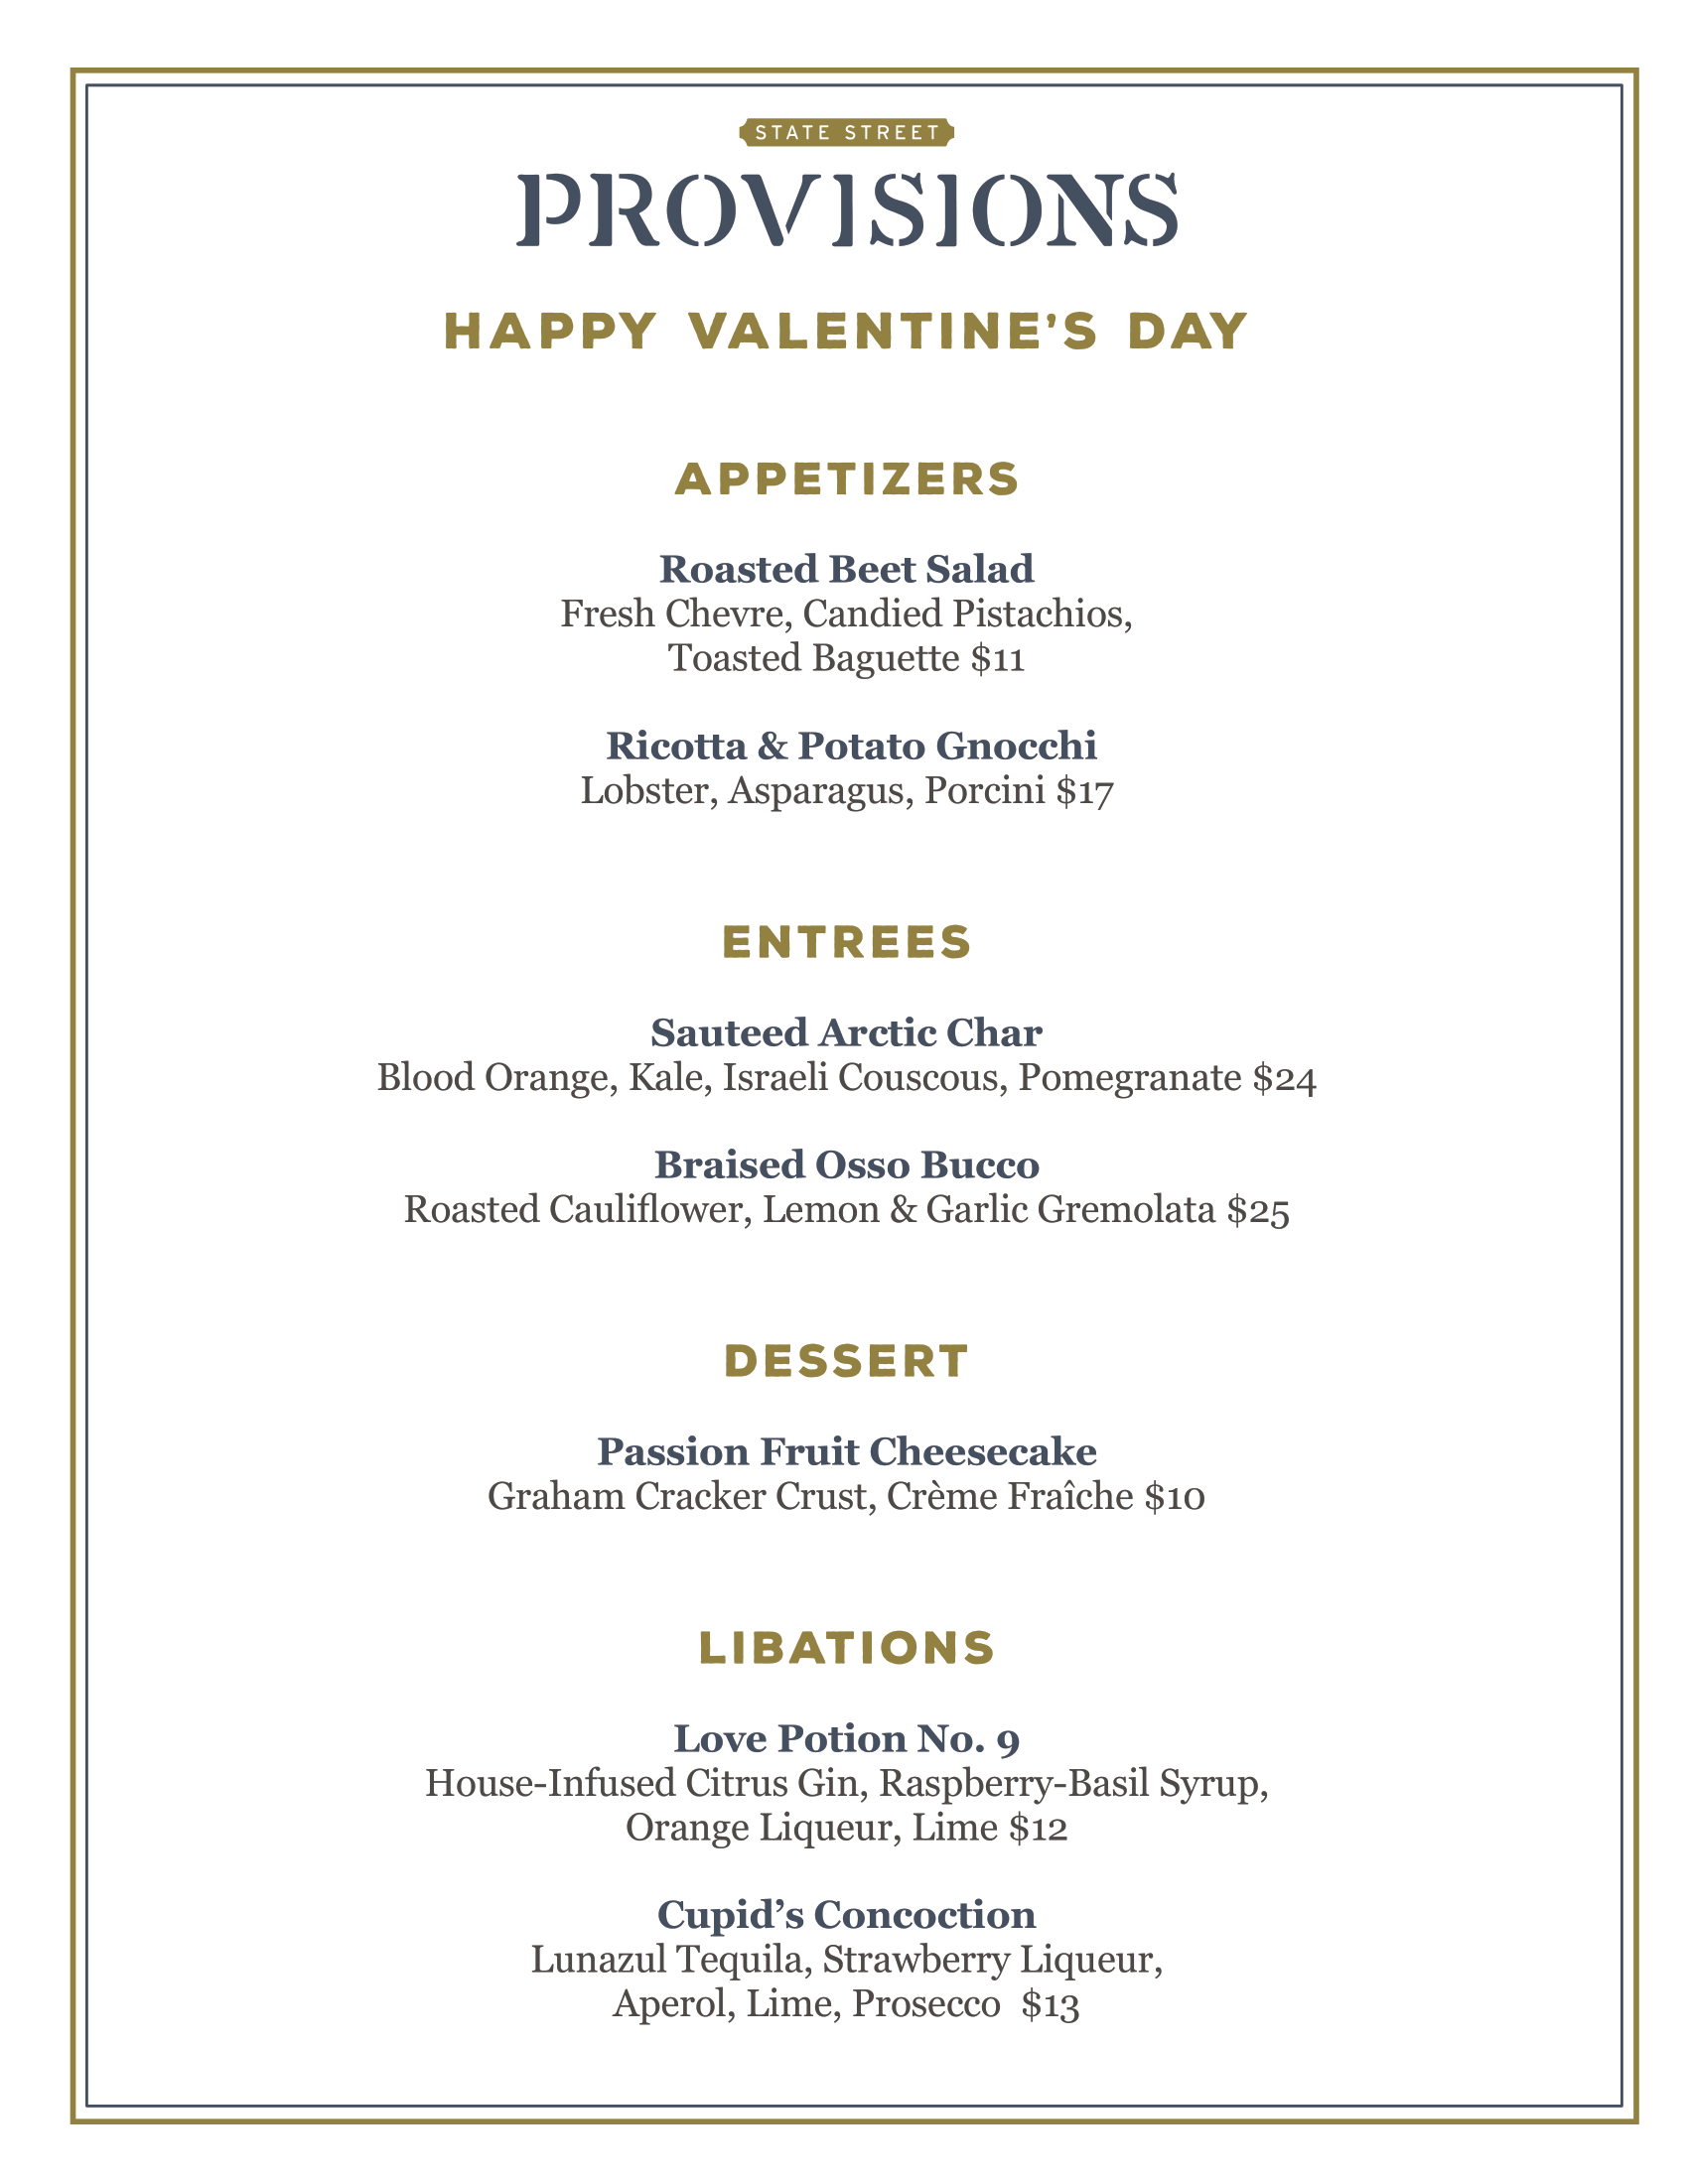 State street provisions valentine's menu